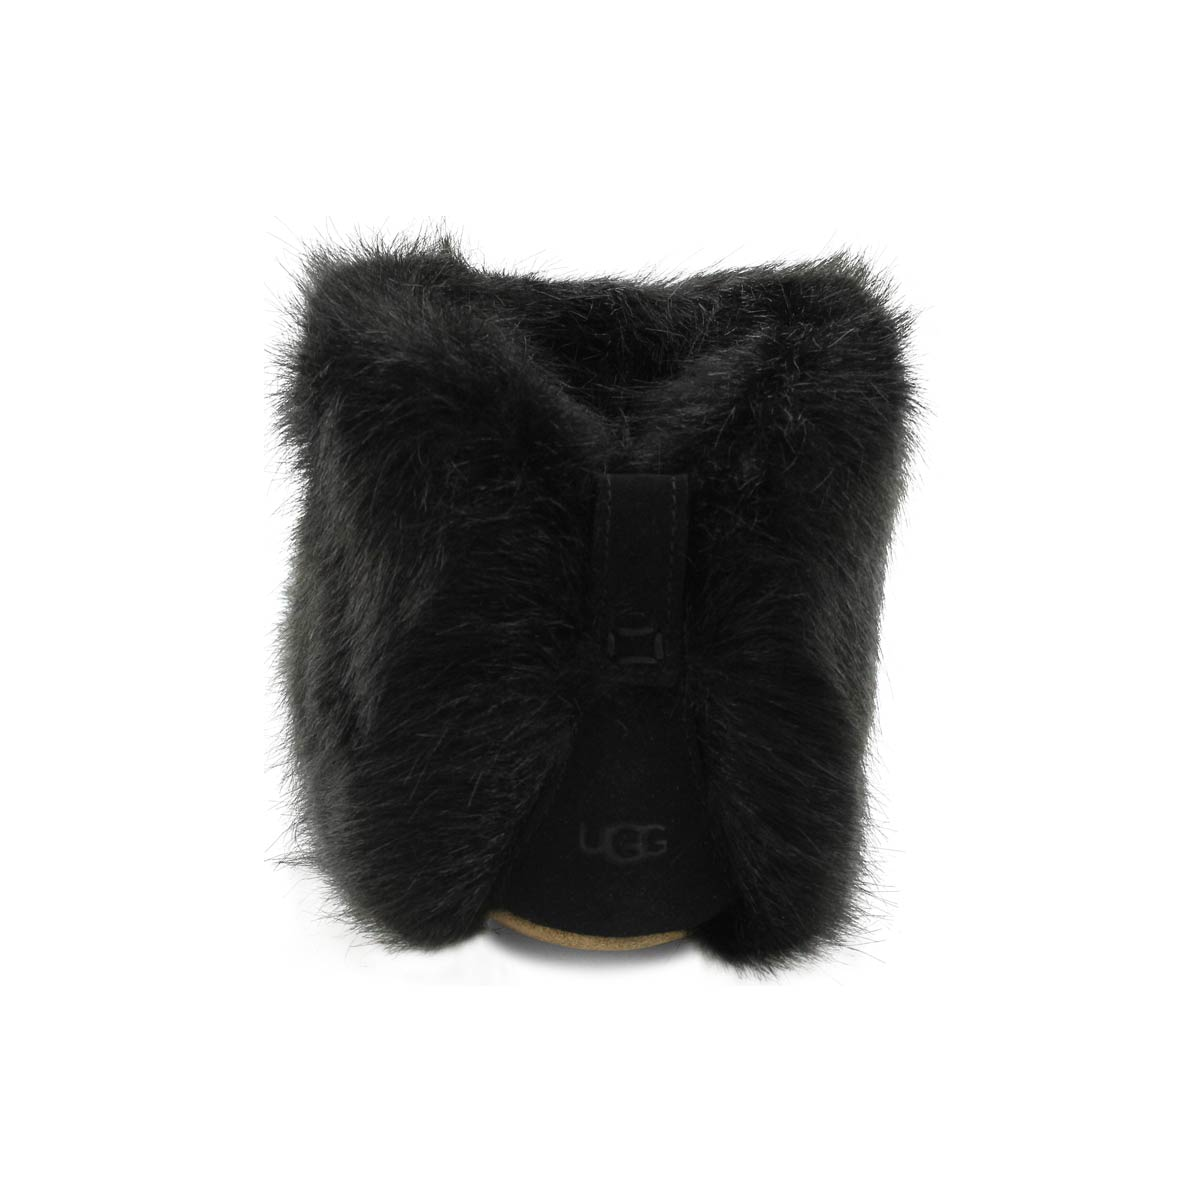 Lds Amary black bootie slipper